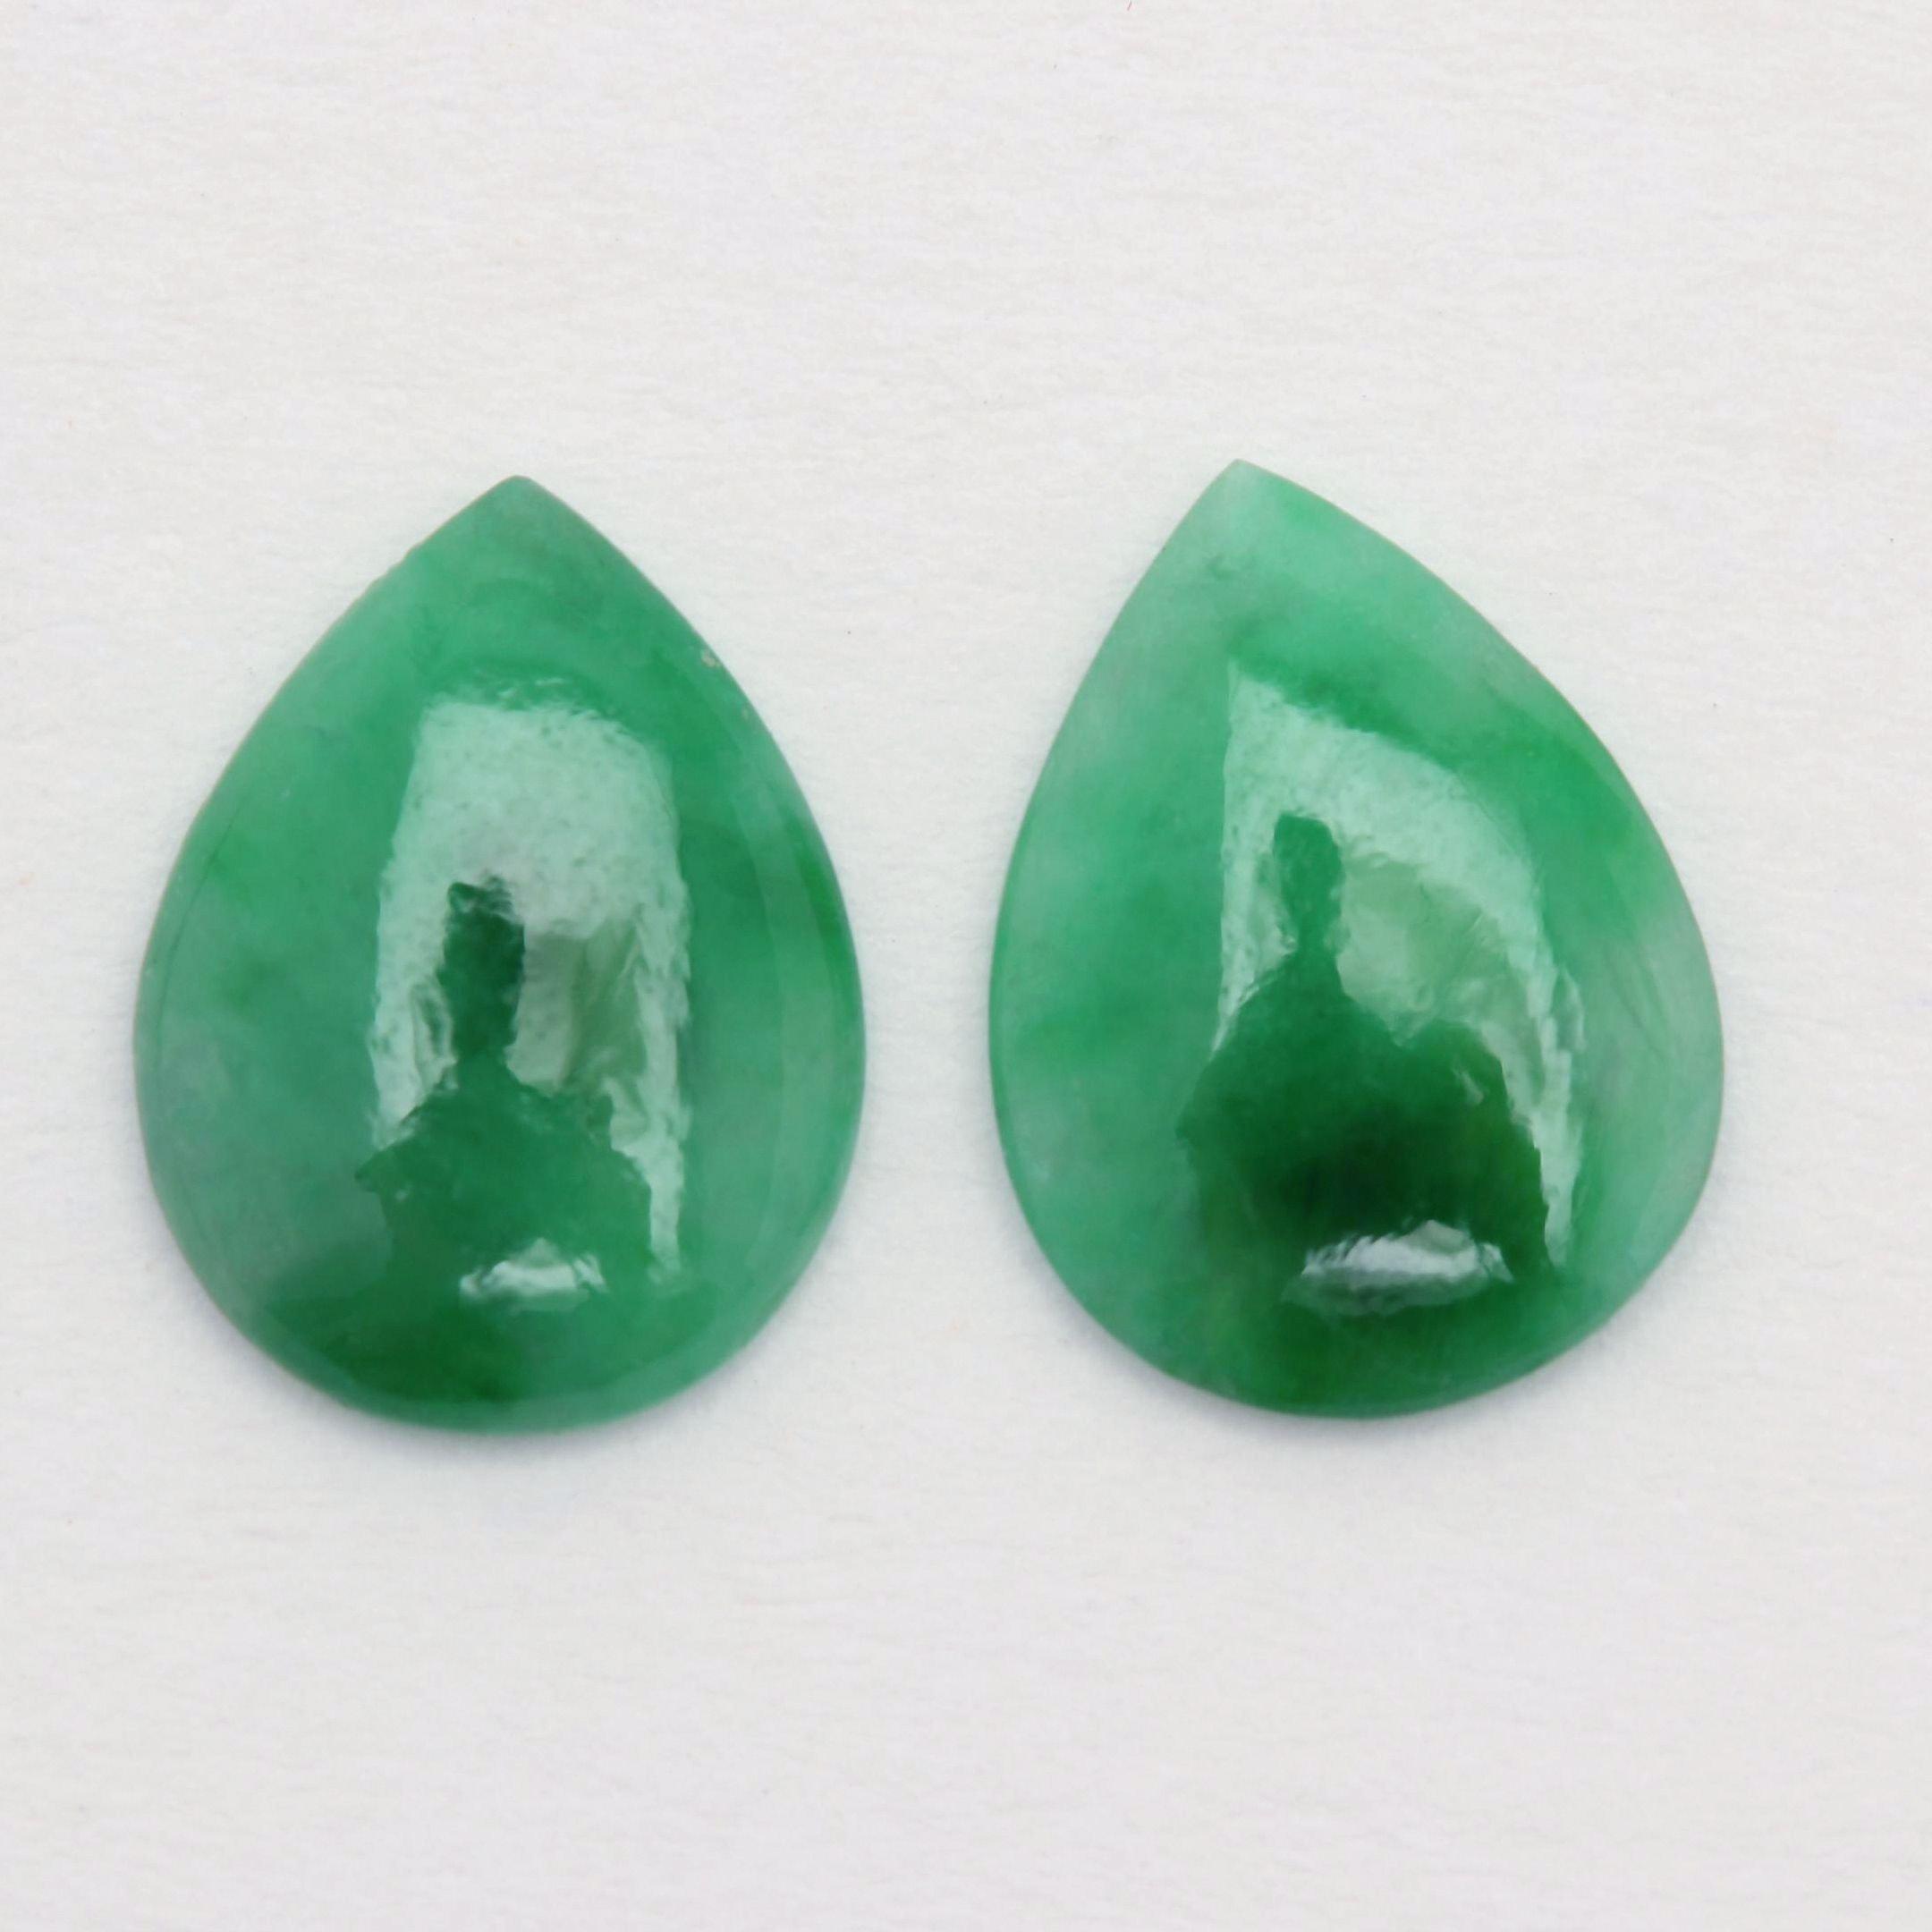 Loose Jadeite Gemstones